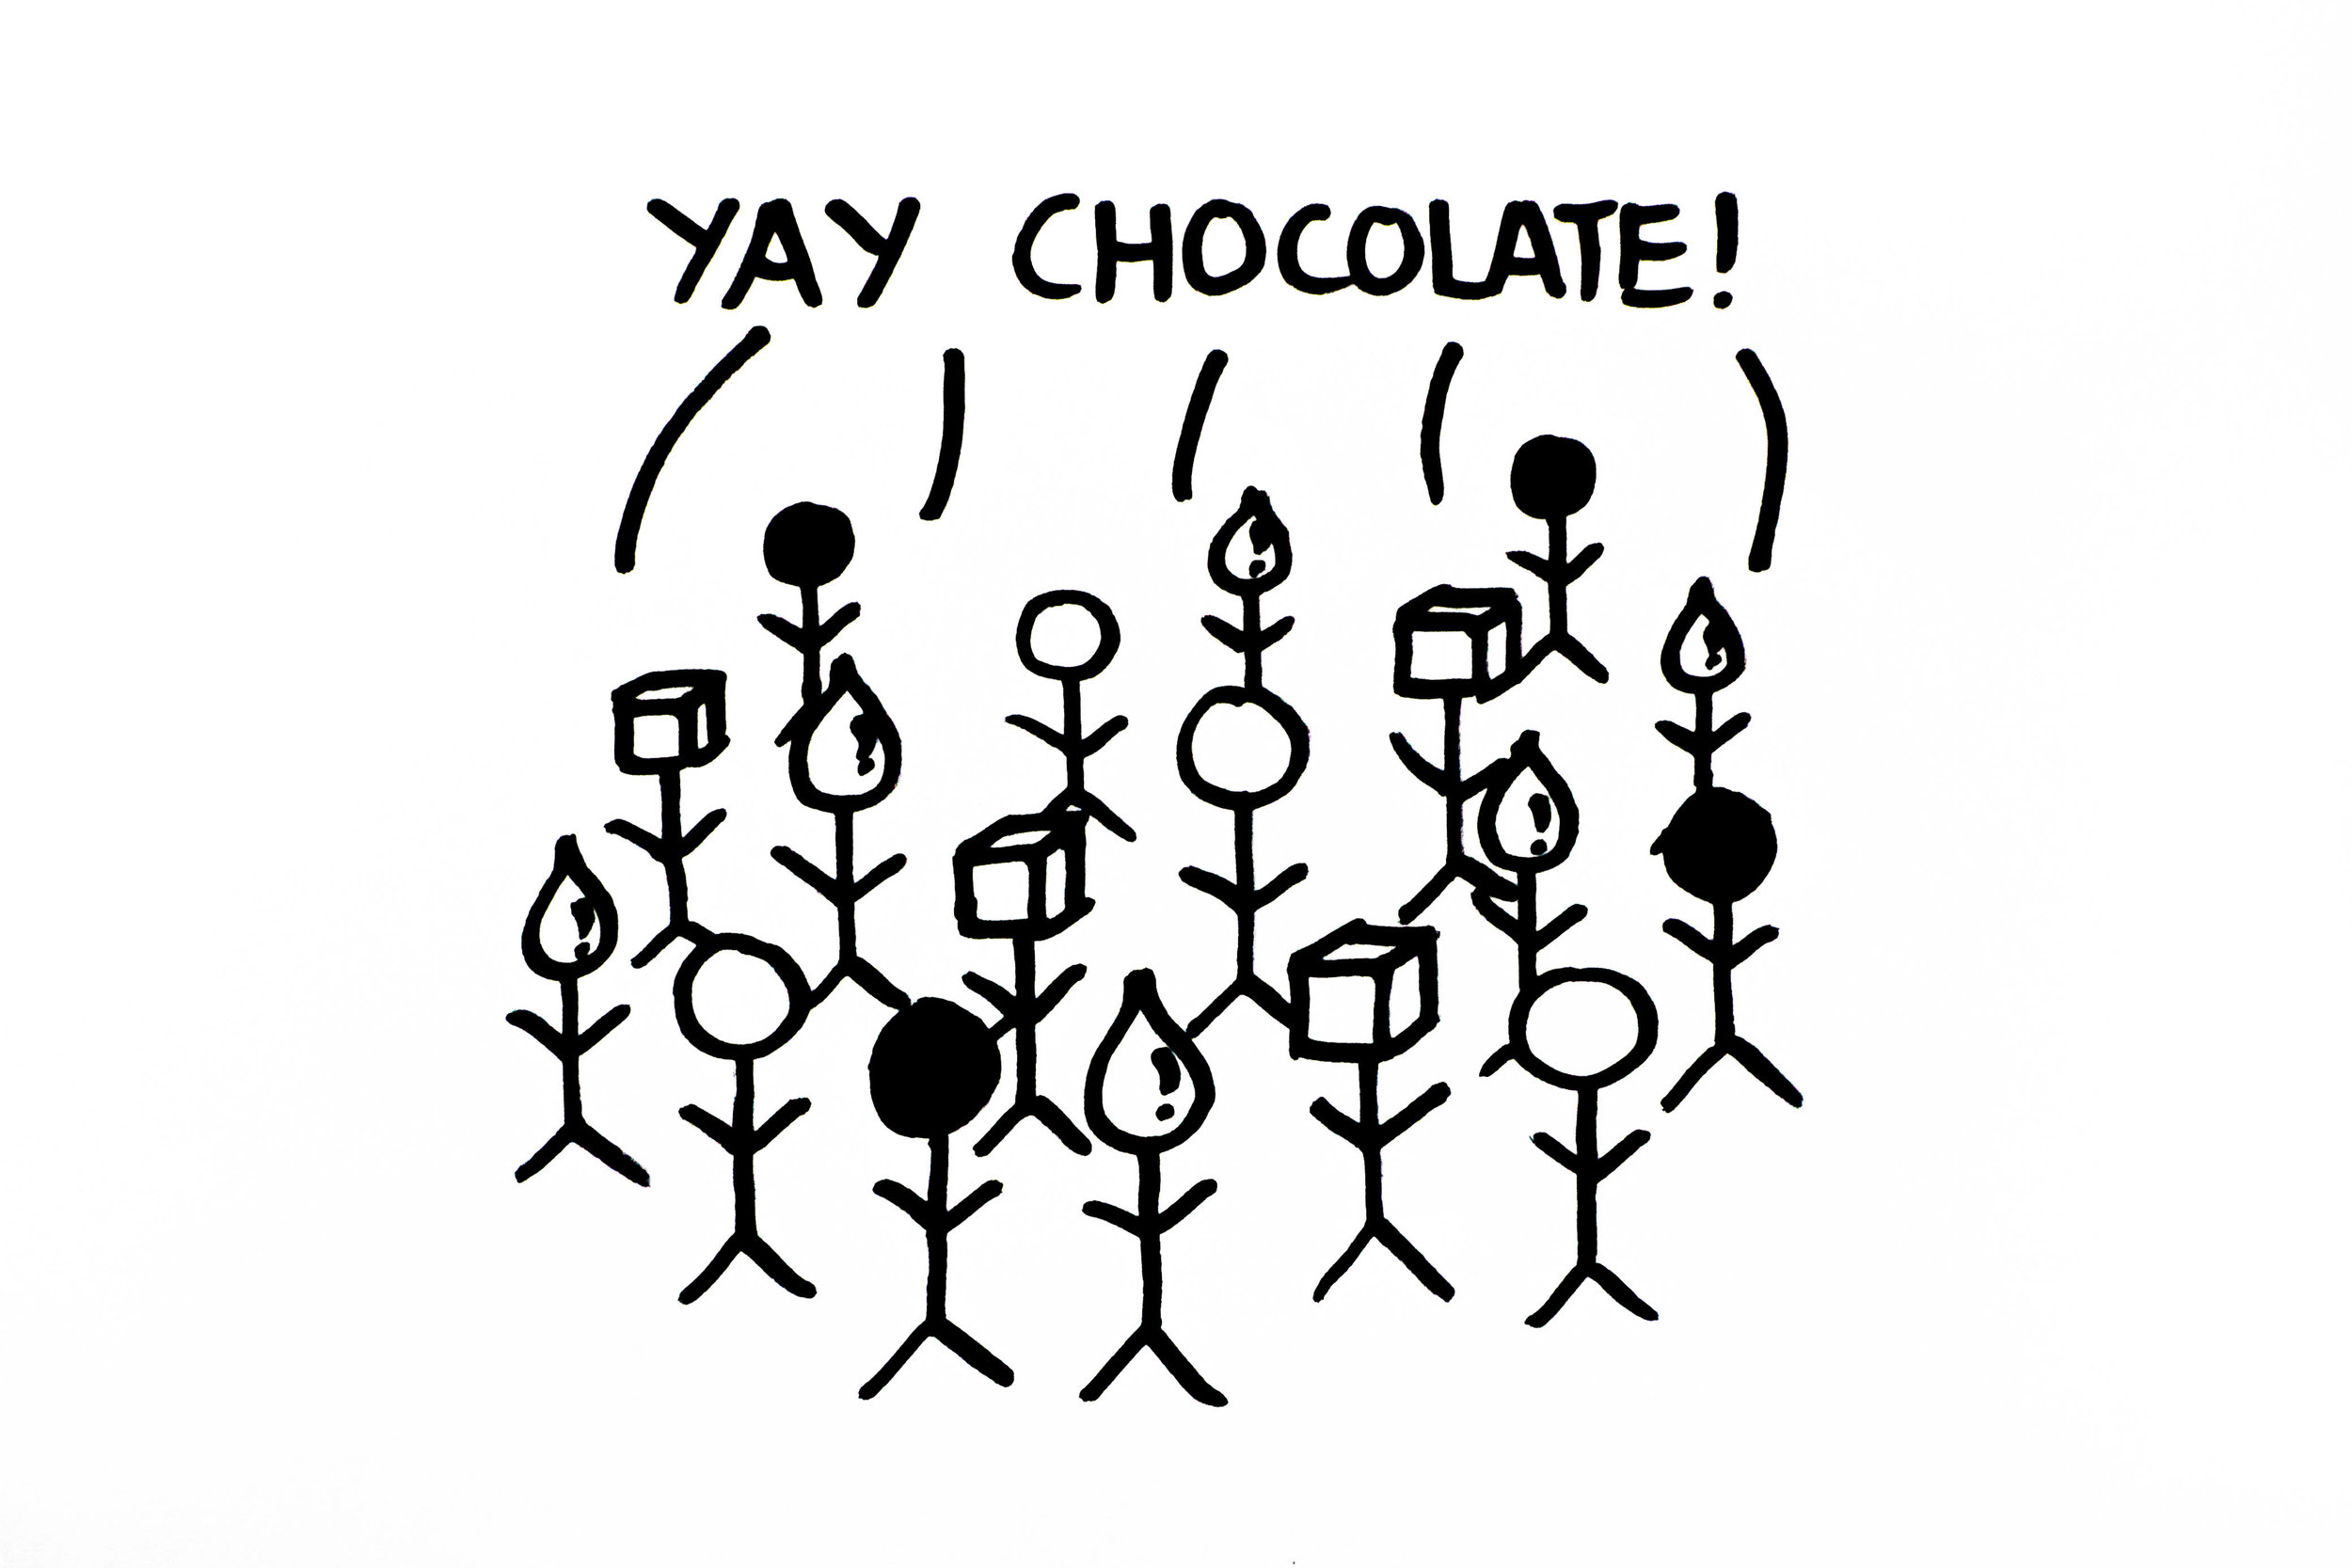 4 - Chocolate again!